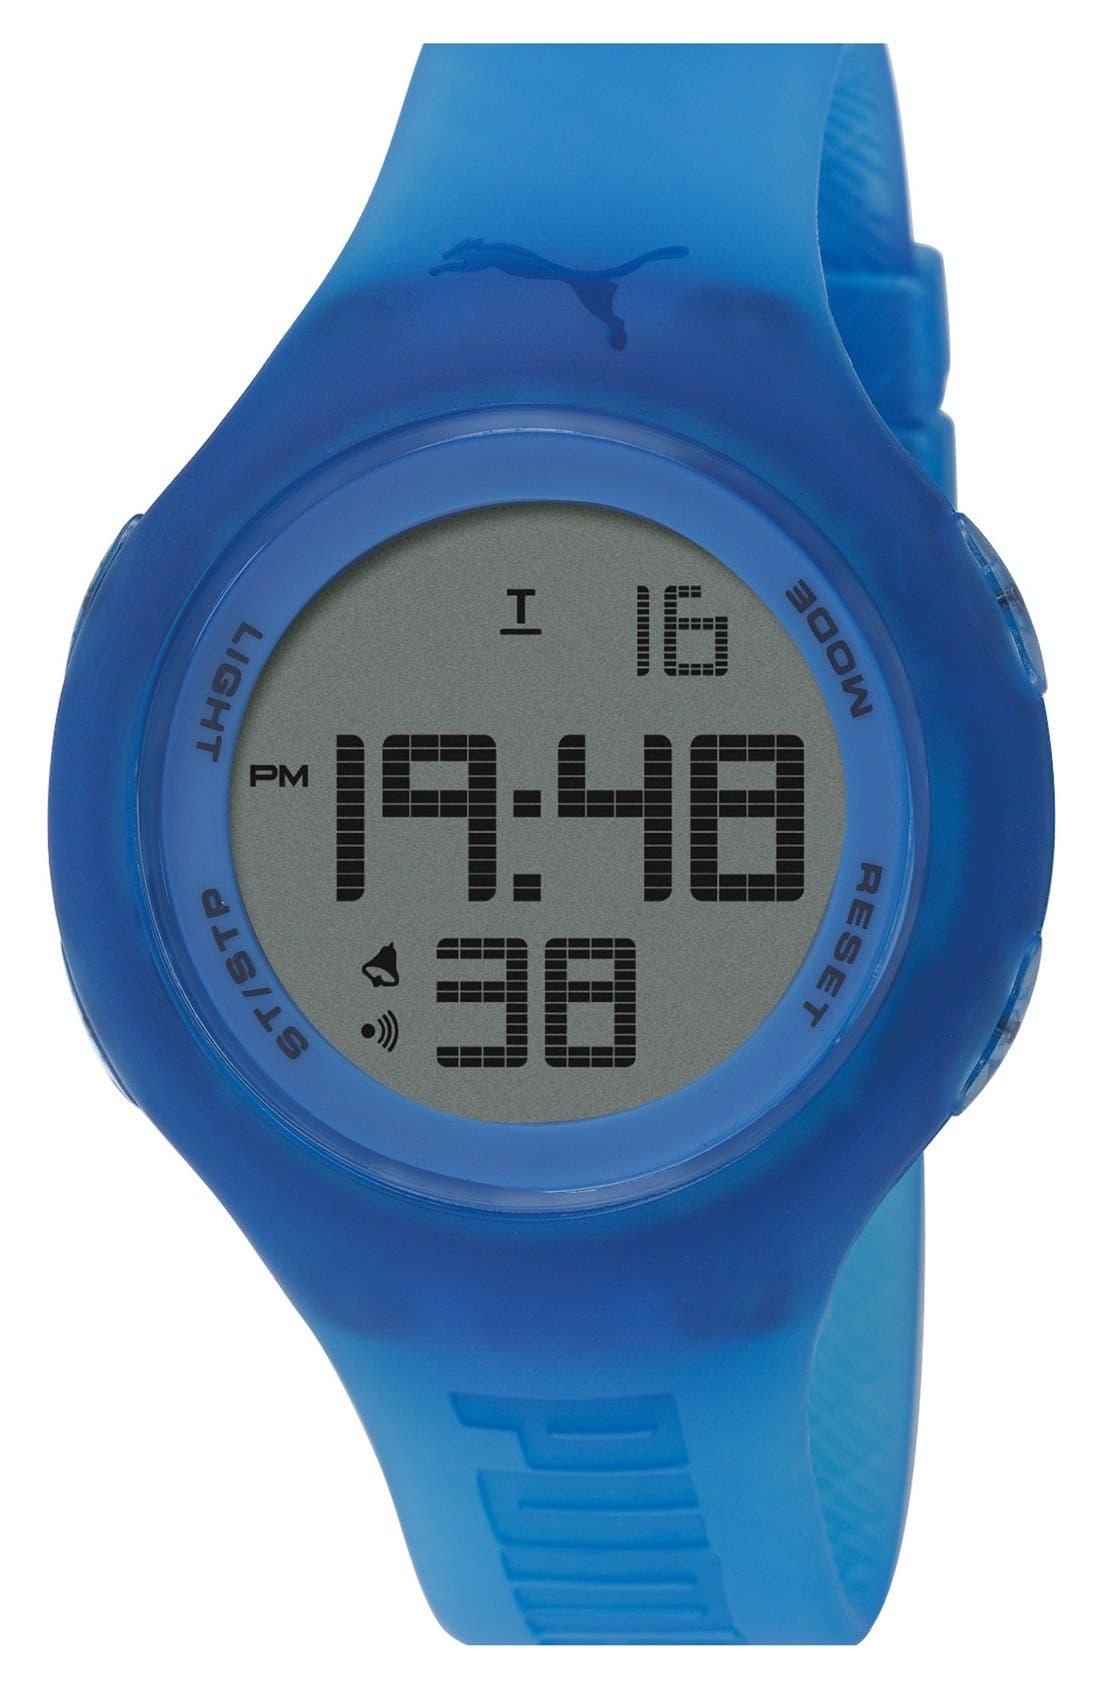 Main Image - PUMA 'Loop' Digital Watch, 44mm